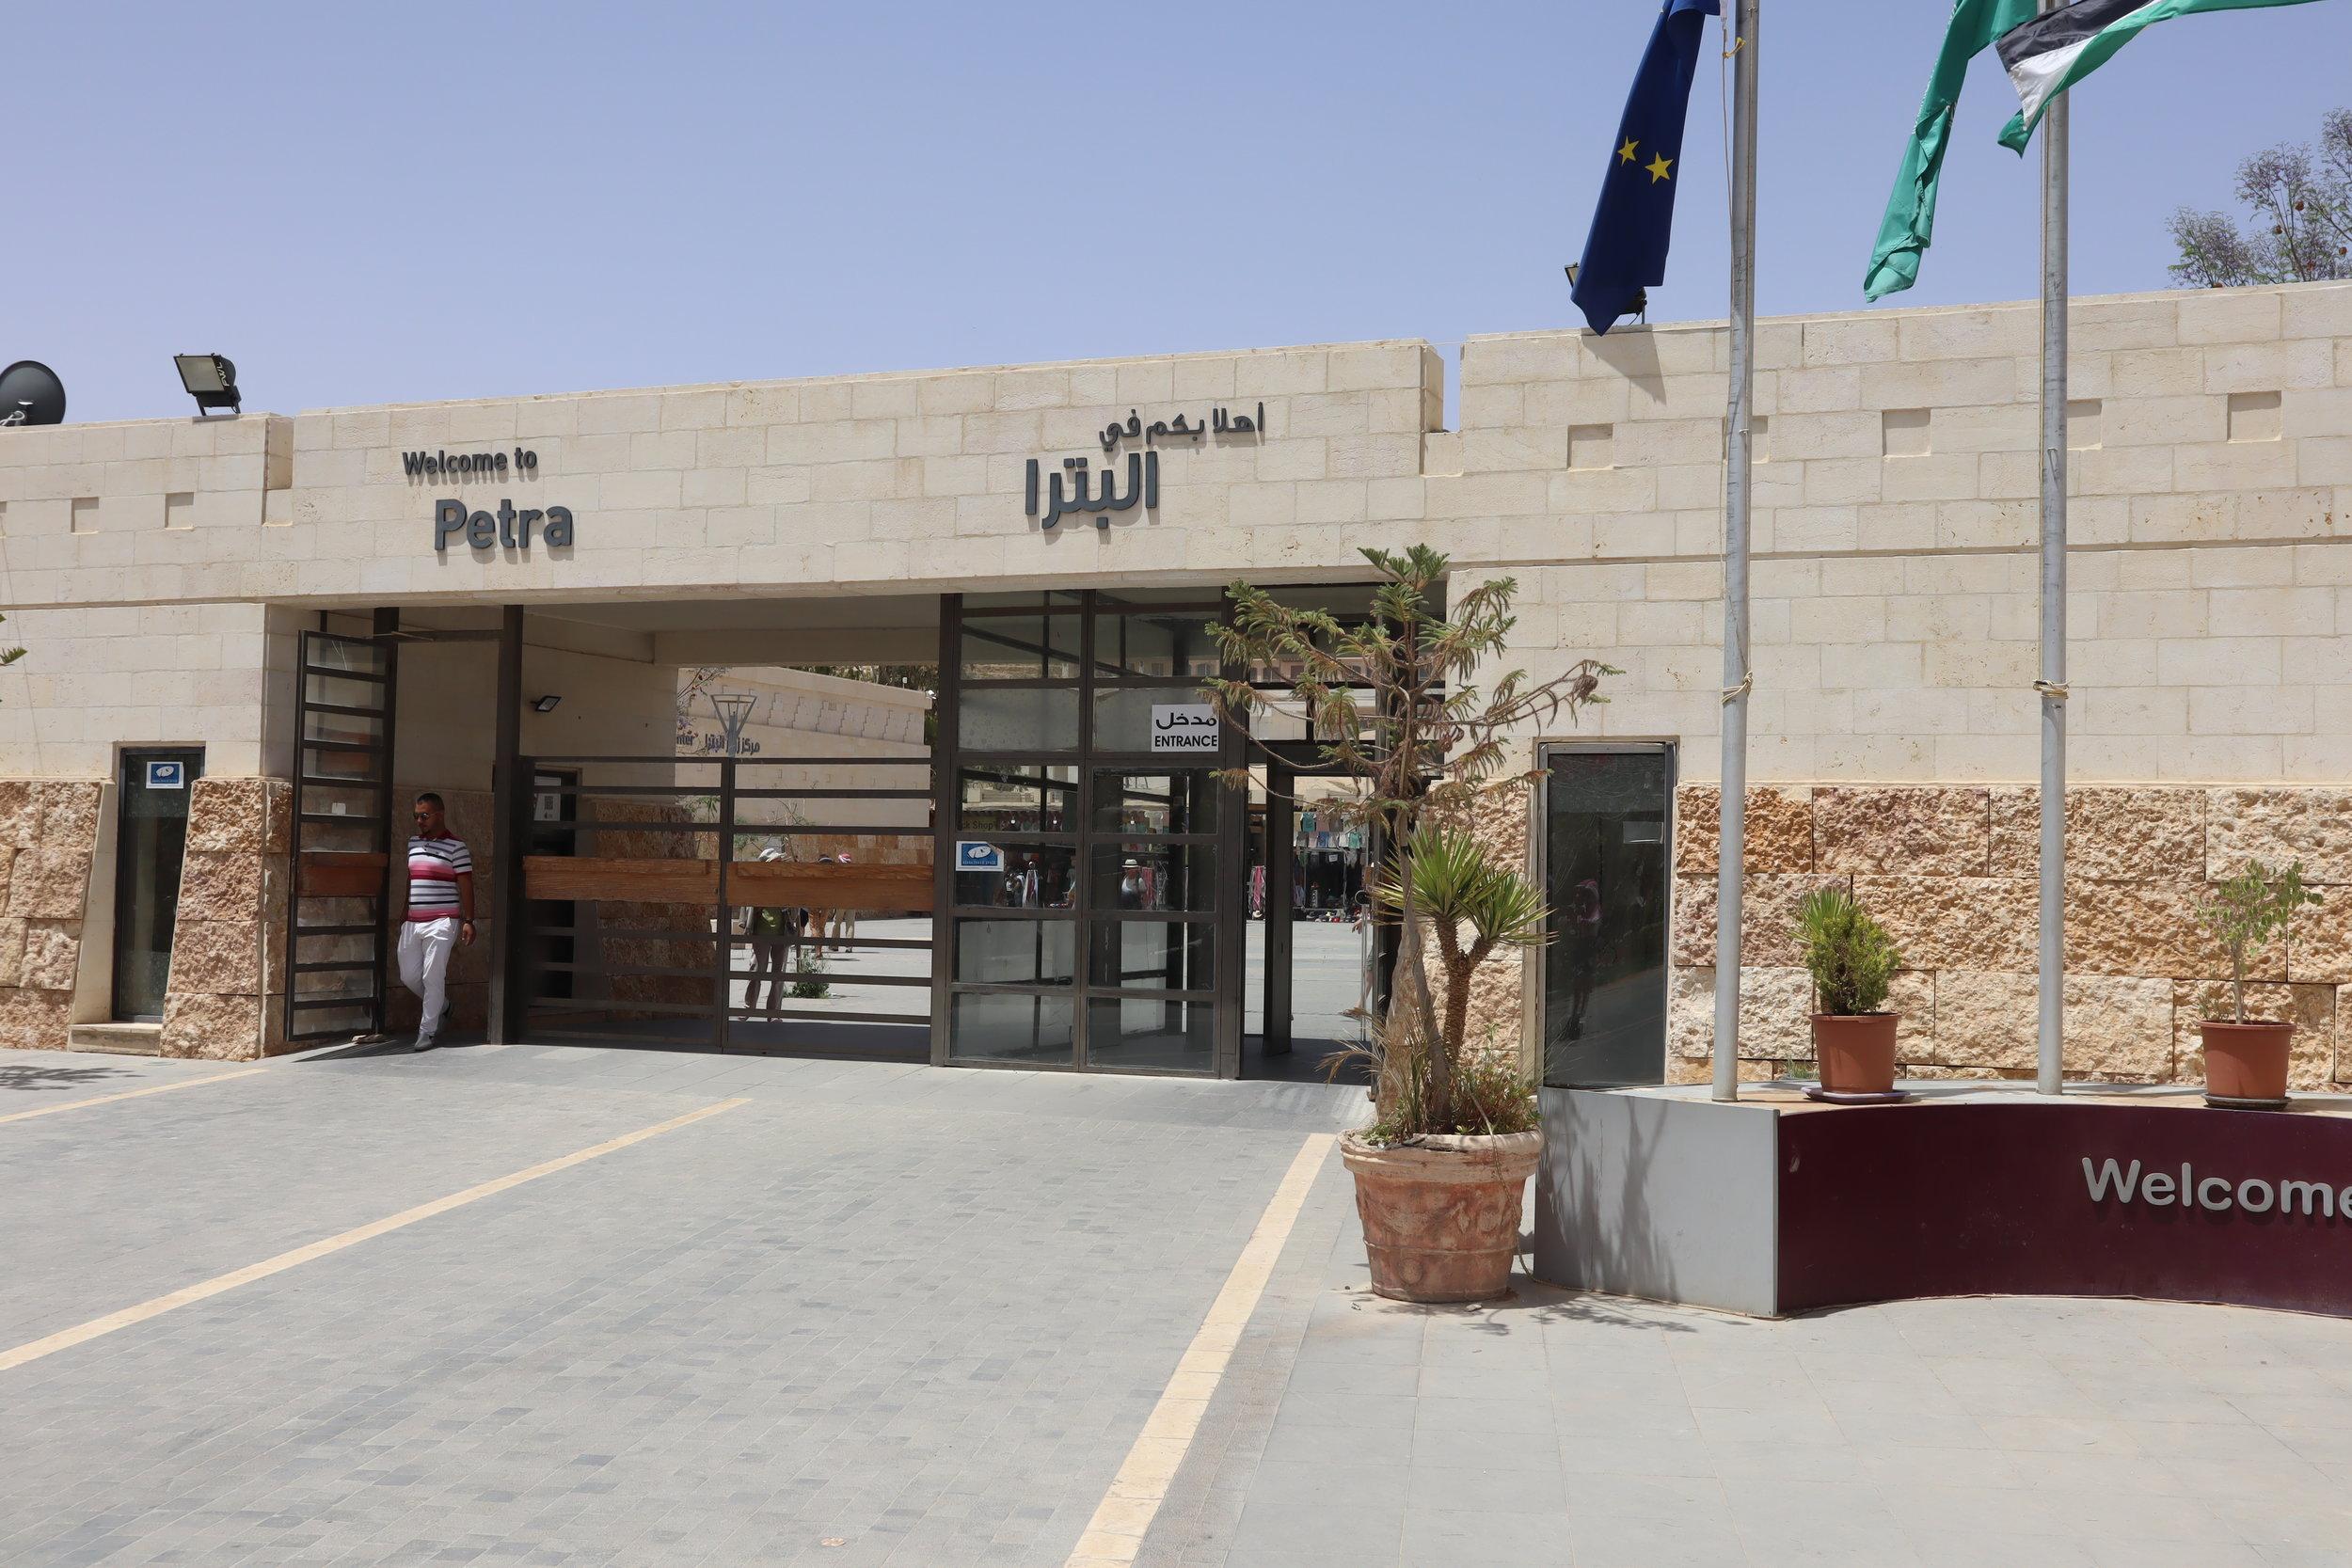 Petra, Jordan – Visitor's centre